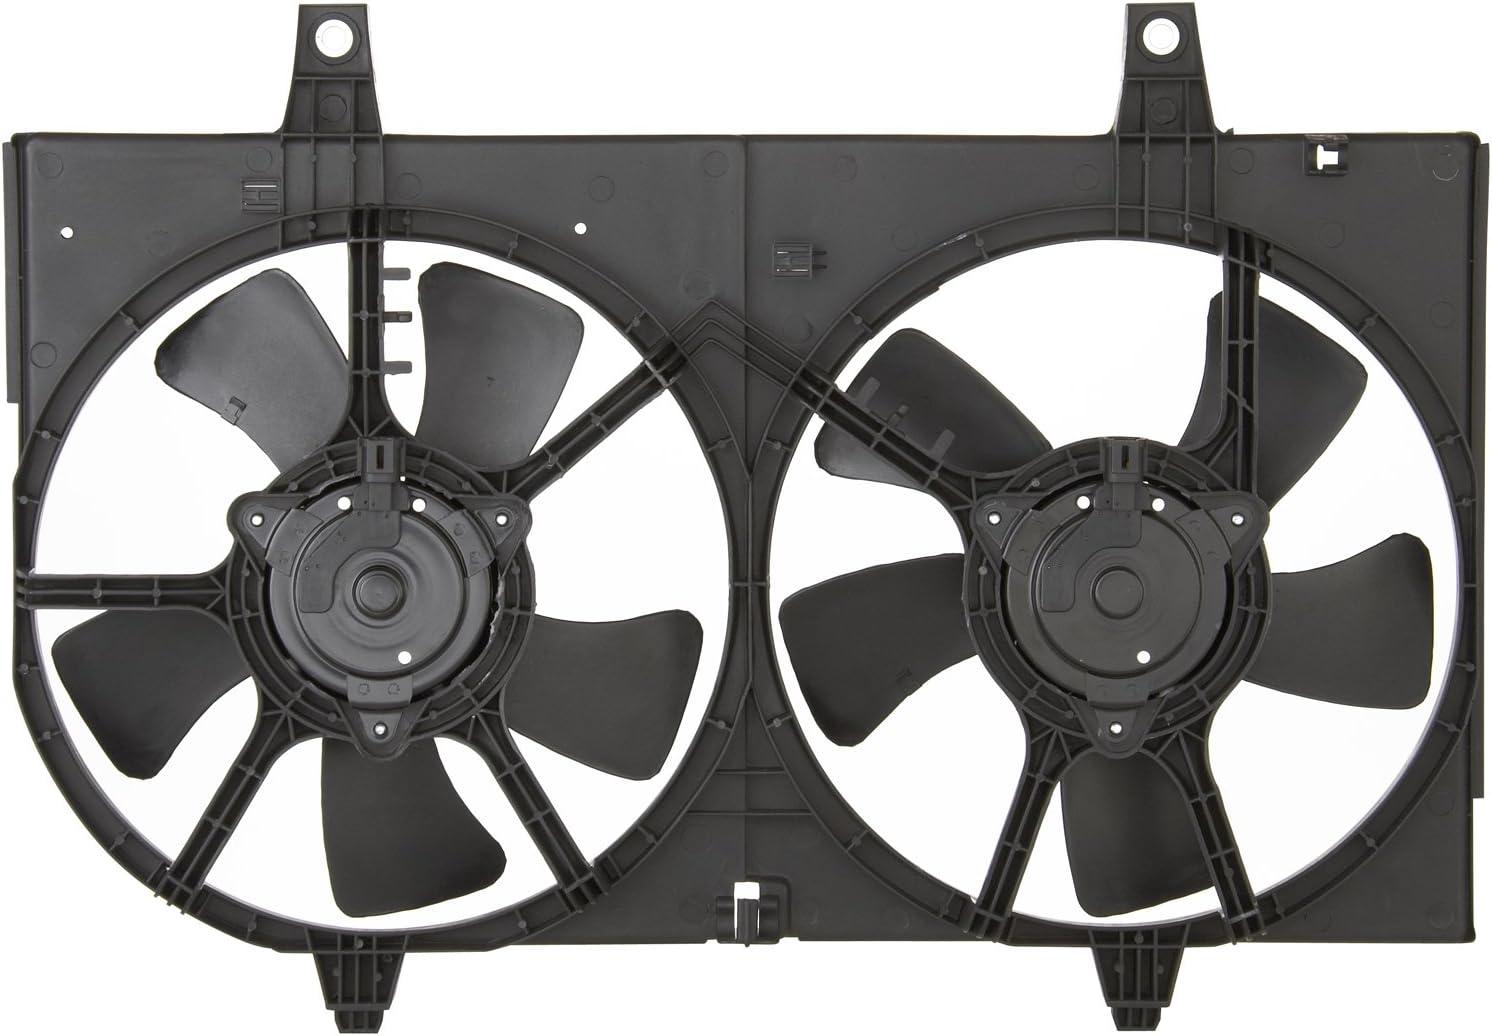 Spectra Premium CF23004 Dual Radiator Fan Assembly